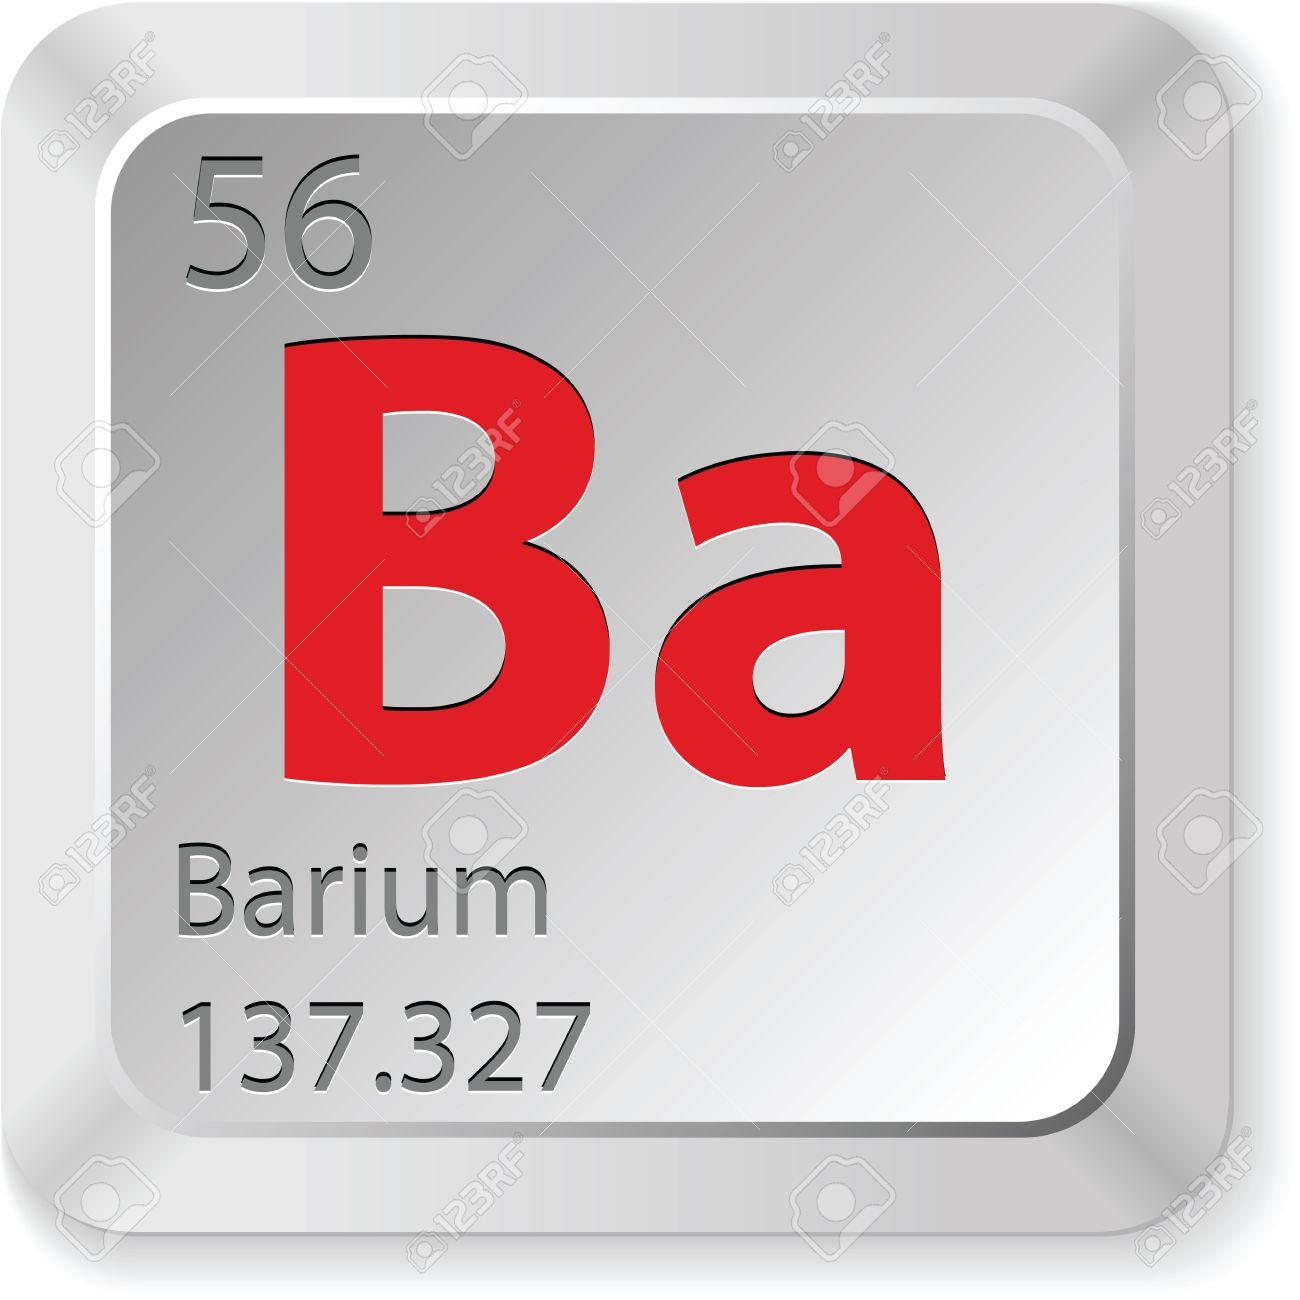 Barium element royalty free cliparts vectors and stock barium element biocorpaavc Images